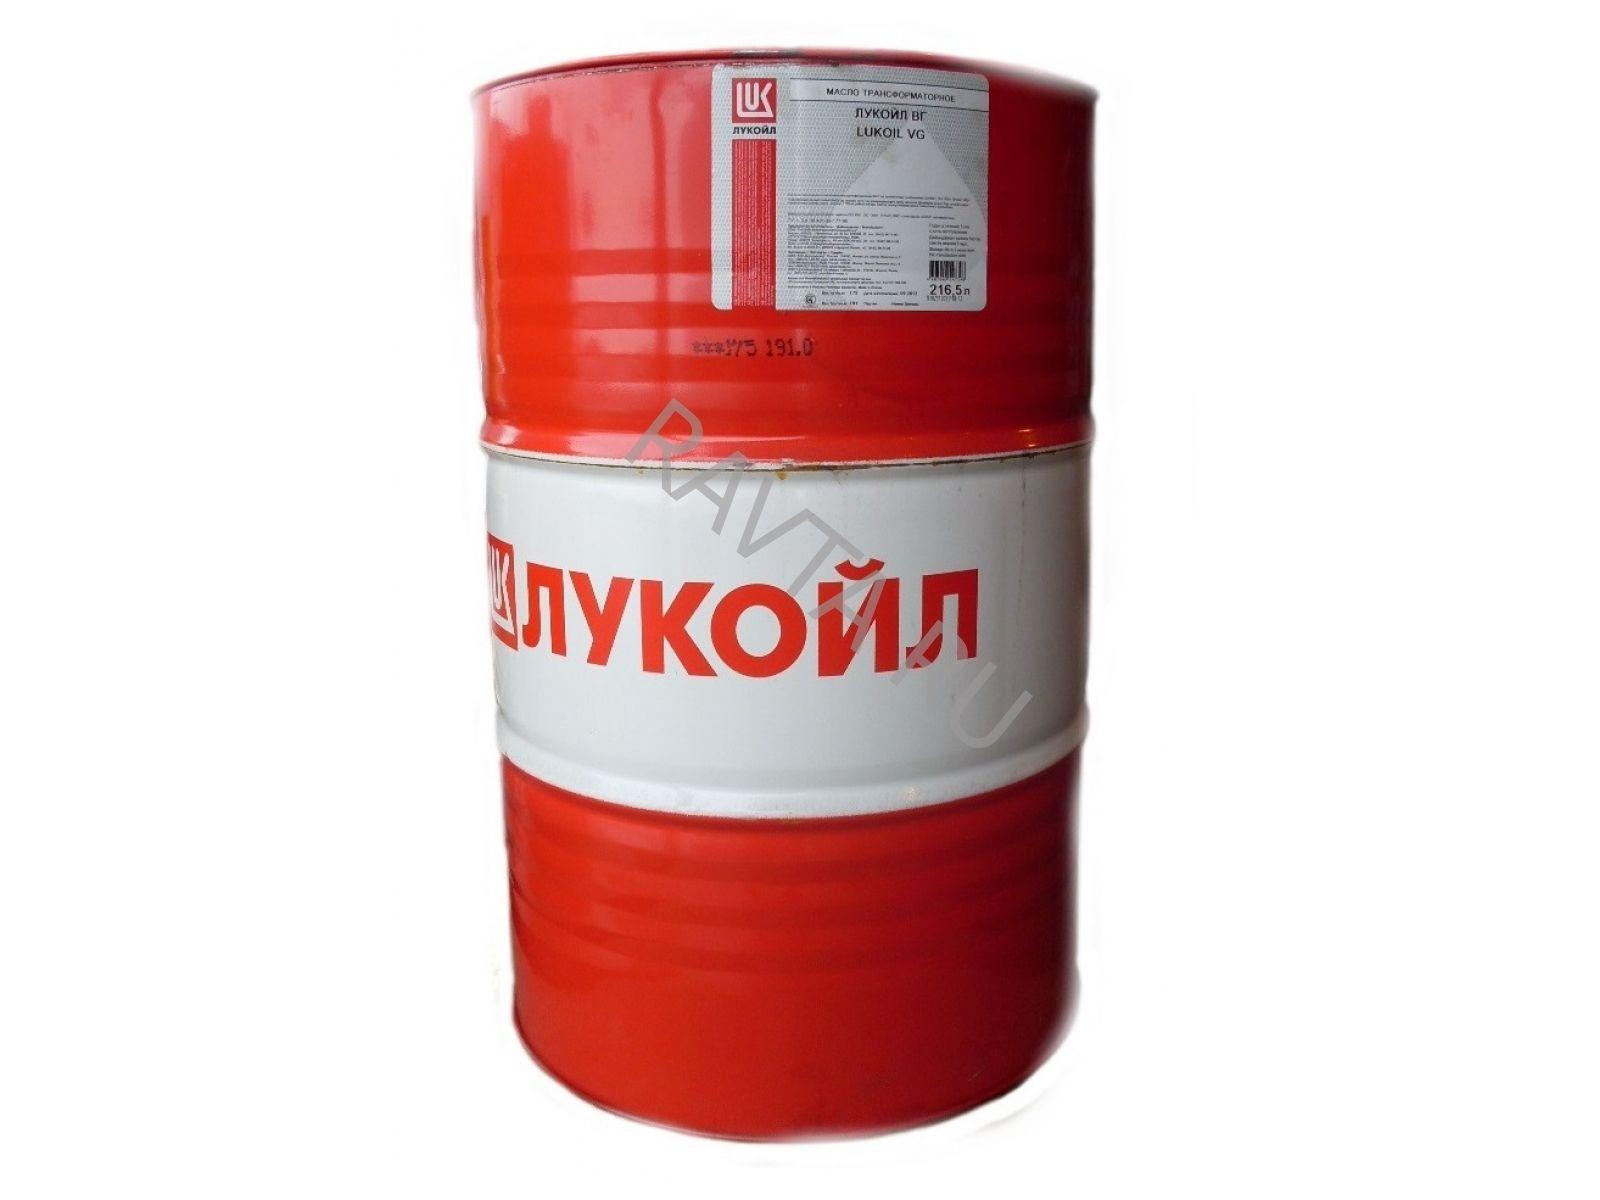 Масло трансформаторное Лукойл ВГ (216,5л/175кг) от Ravta